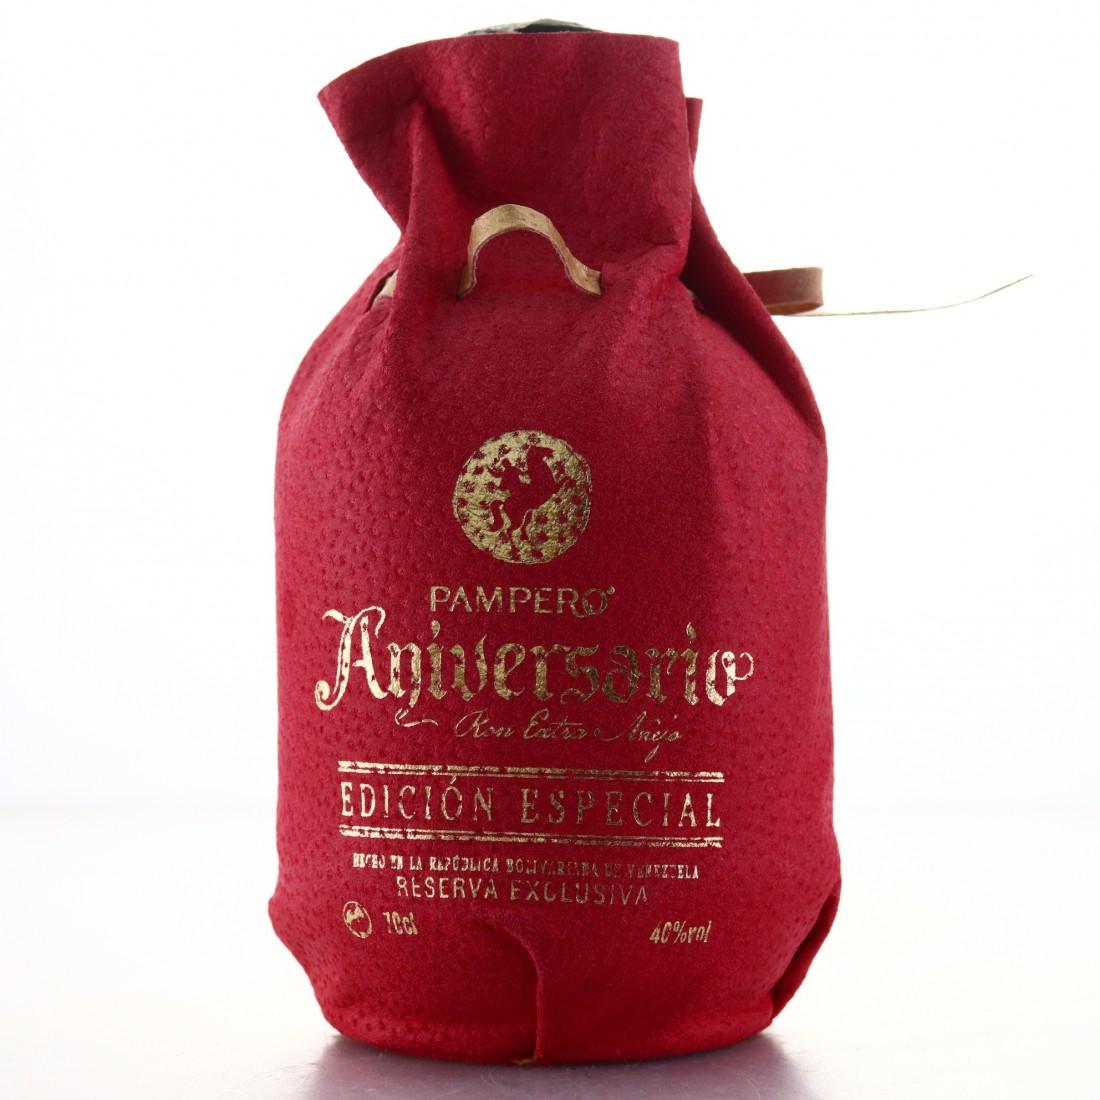 Pampero Aniversario Rum